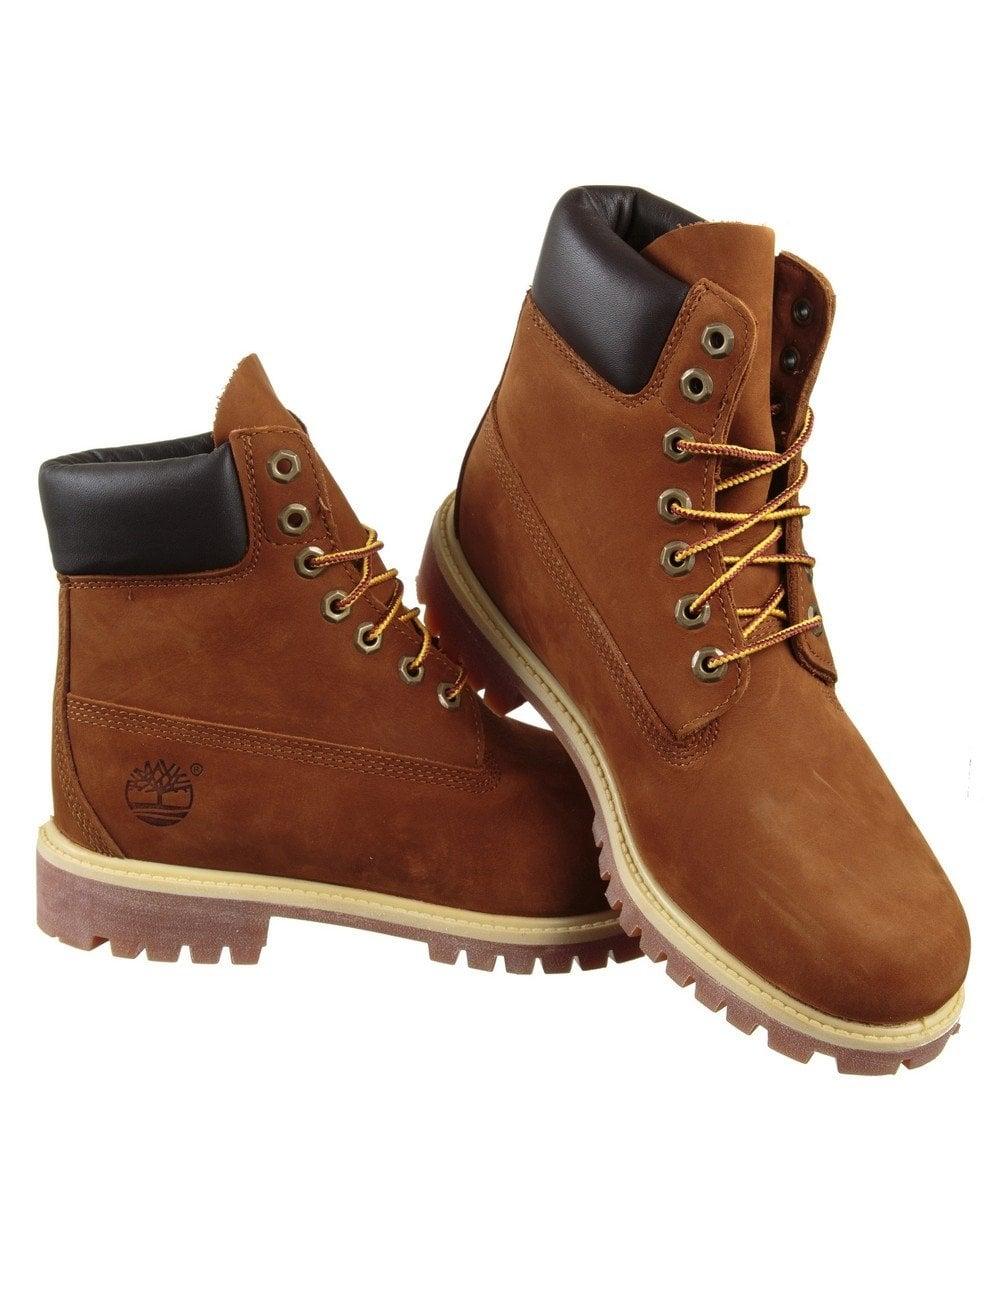 ff610dbc687e Timberland 6-inch Premium Waterproof Boot - Rust Orange - Shoes ...